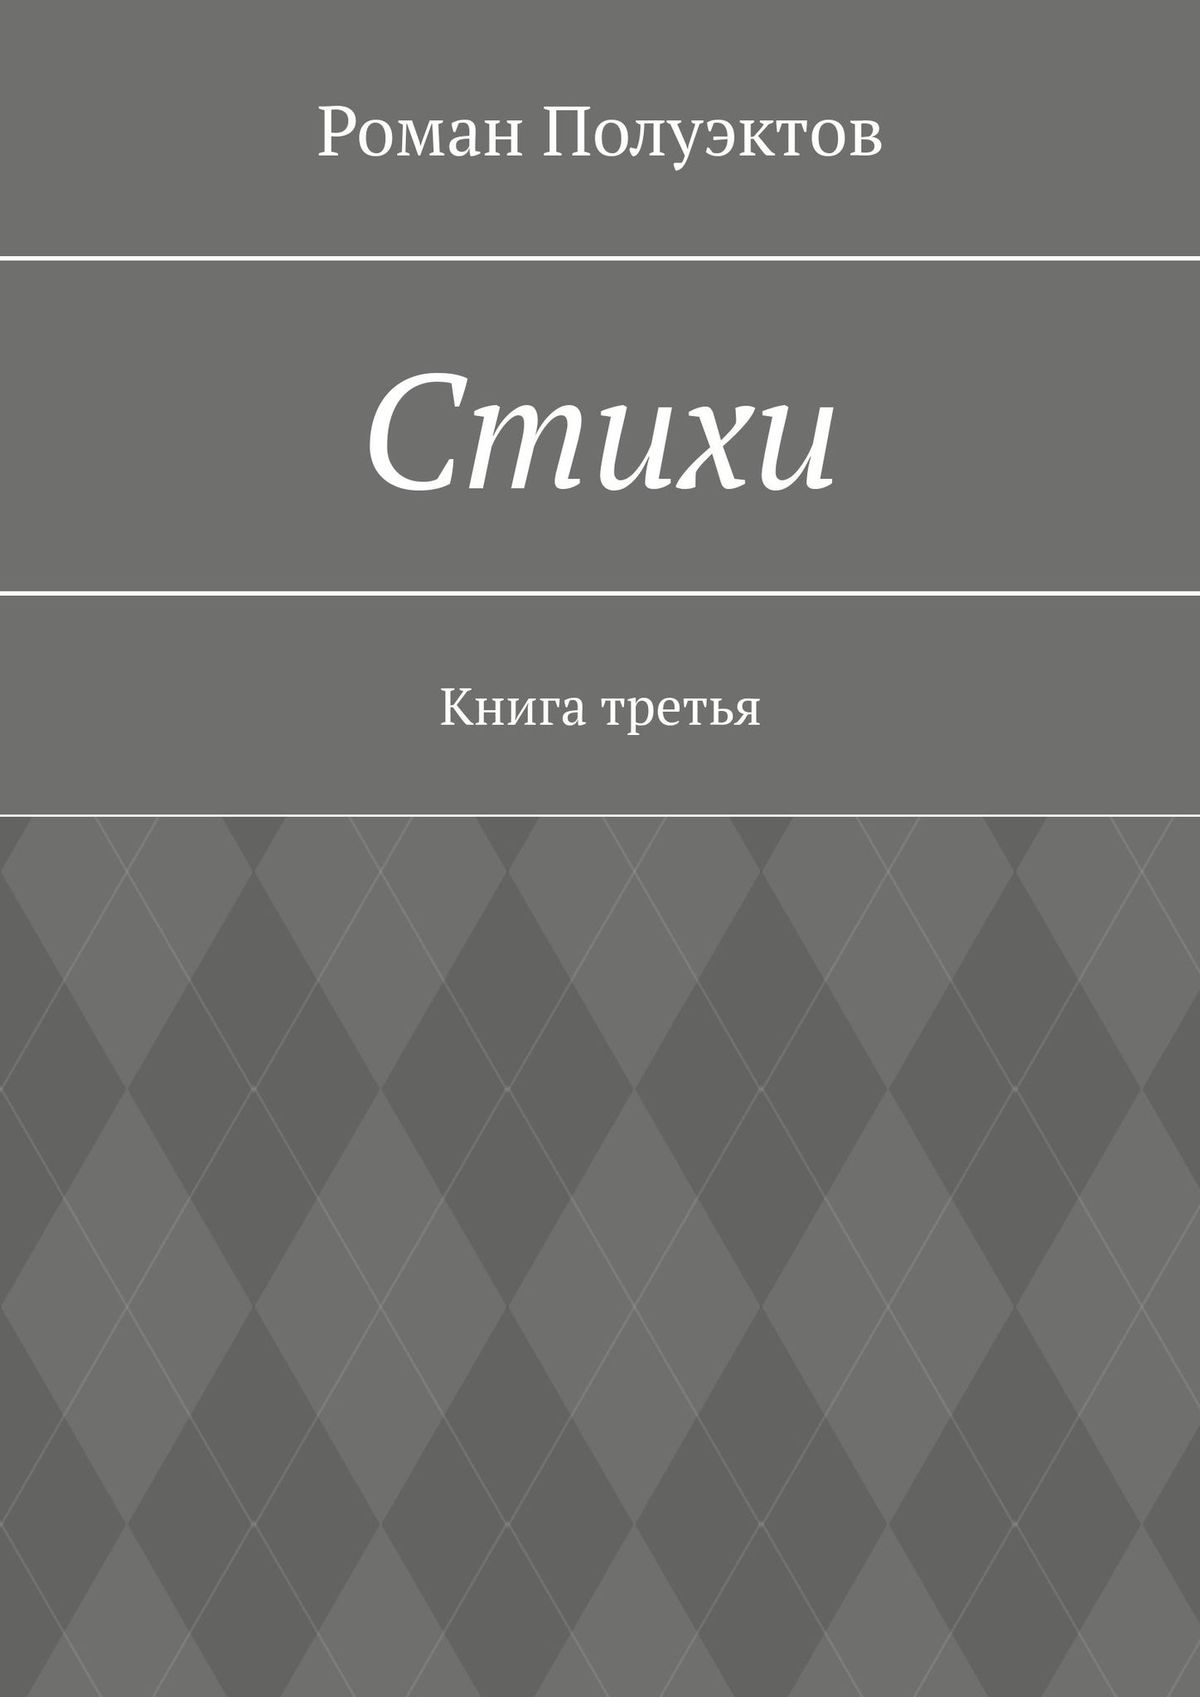 Роман Полуэктов Стихи. Книга третья аппиано алессандра завтра все наладится роман